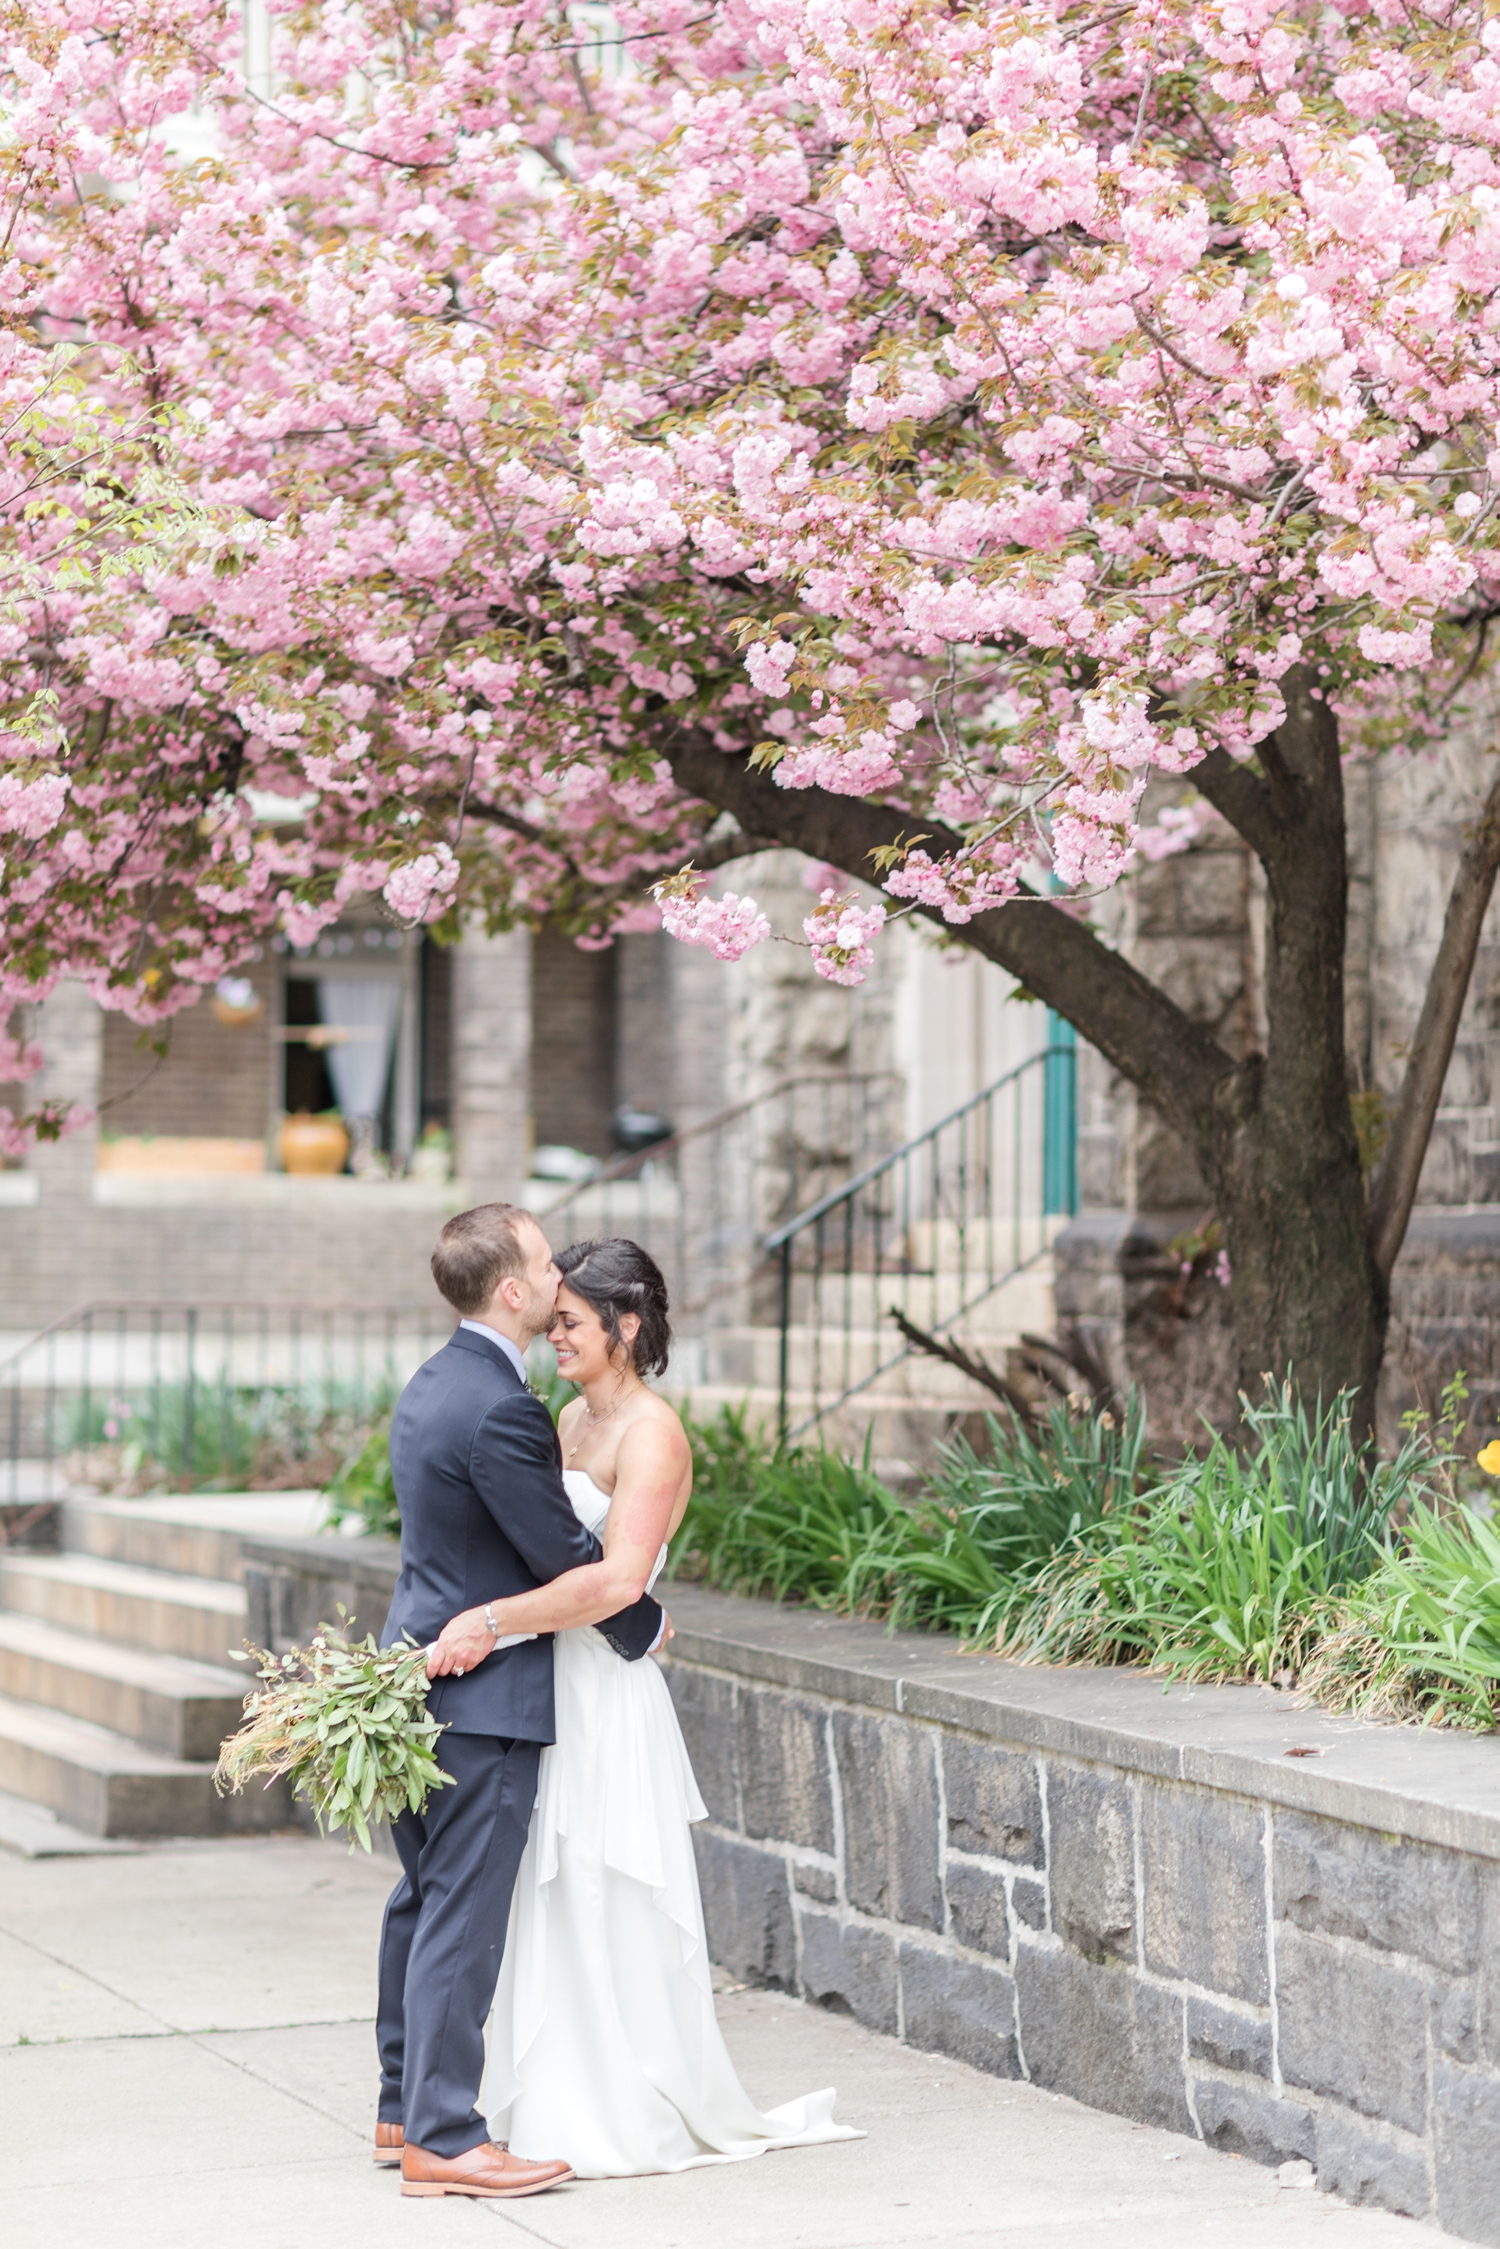 Matt & Angel Skarzynski Wedding WEDDING HIGHLIGHTS-158_2640-Space-wedding-Baltimore-Maryland-wedding-photographer-Patapsco-State-Park-engagement-anna-grace-photography-photo.jpg